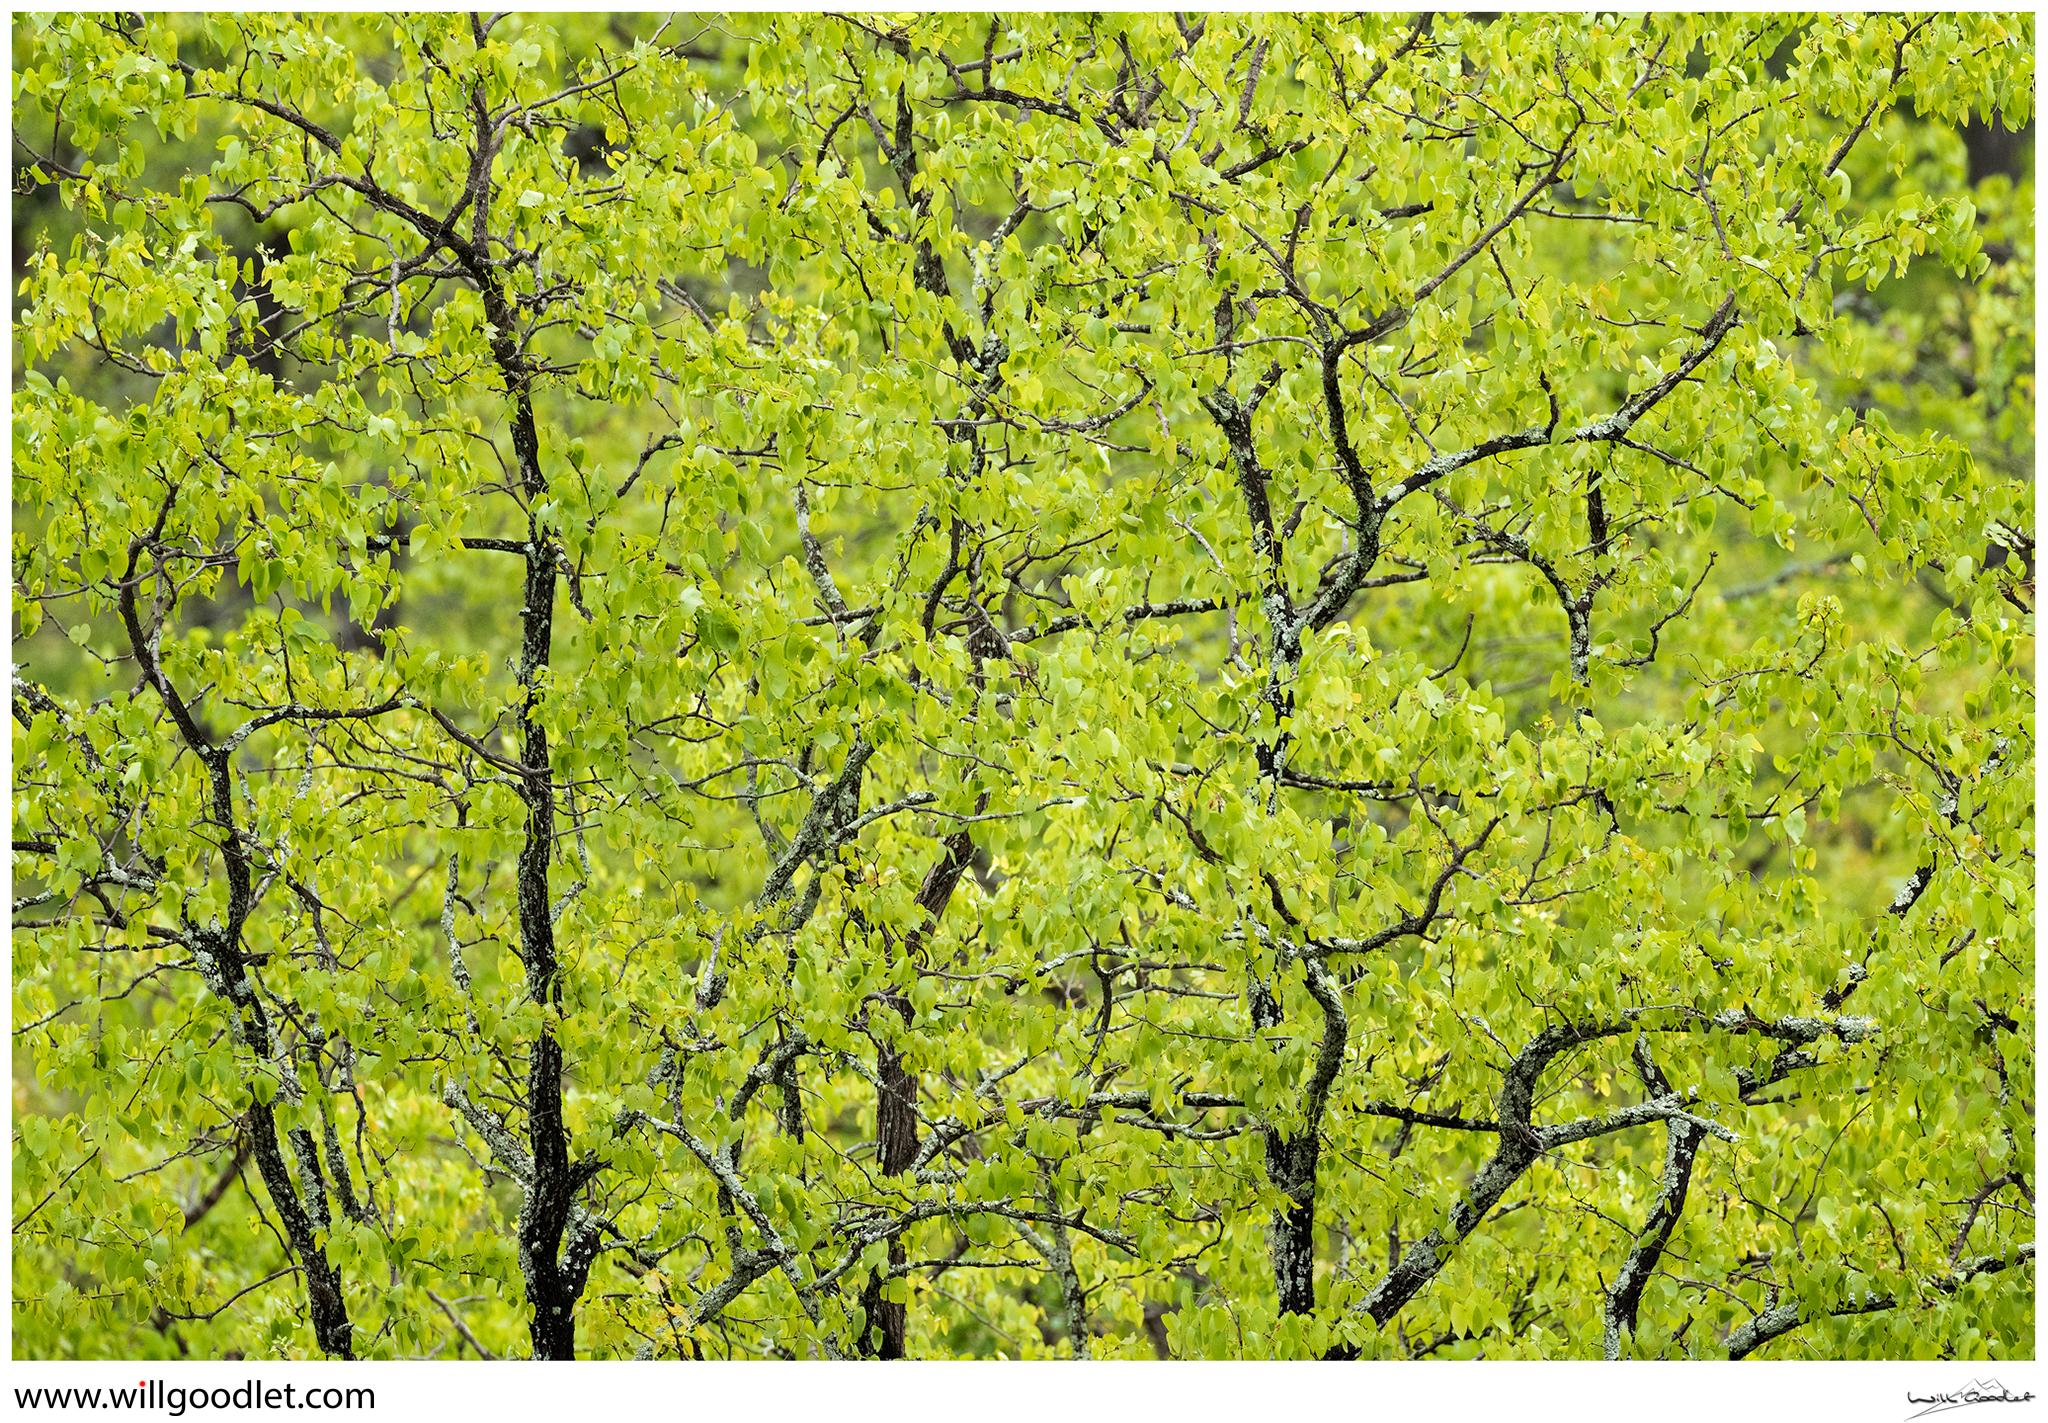 Tsendze Rustic Camp, fresh green mopane leaves in spring.